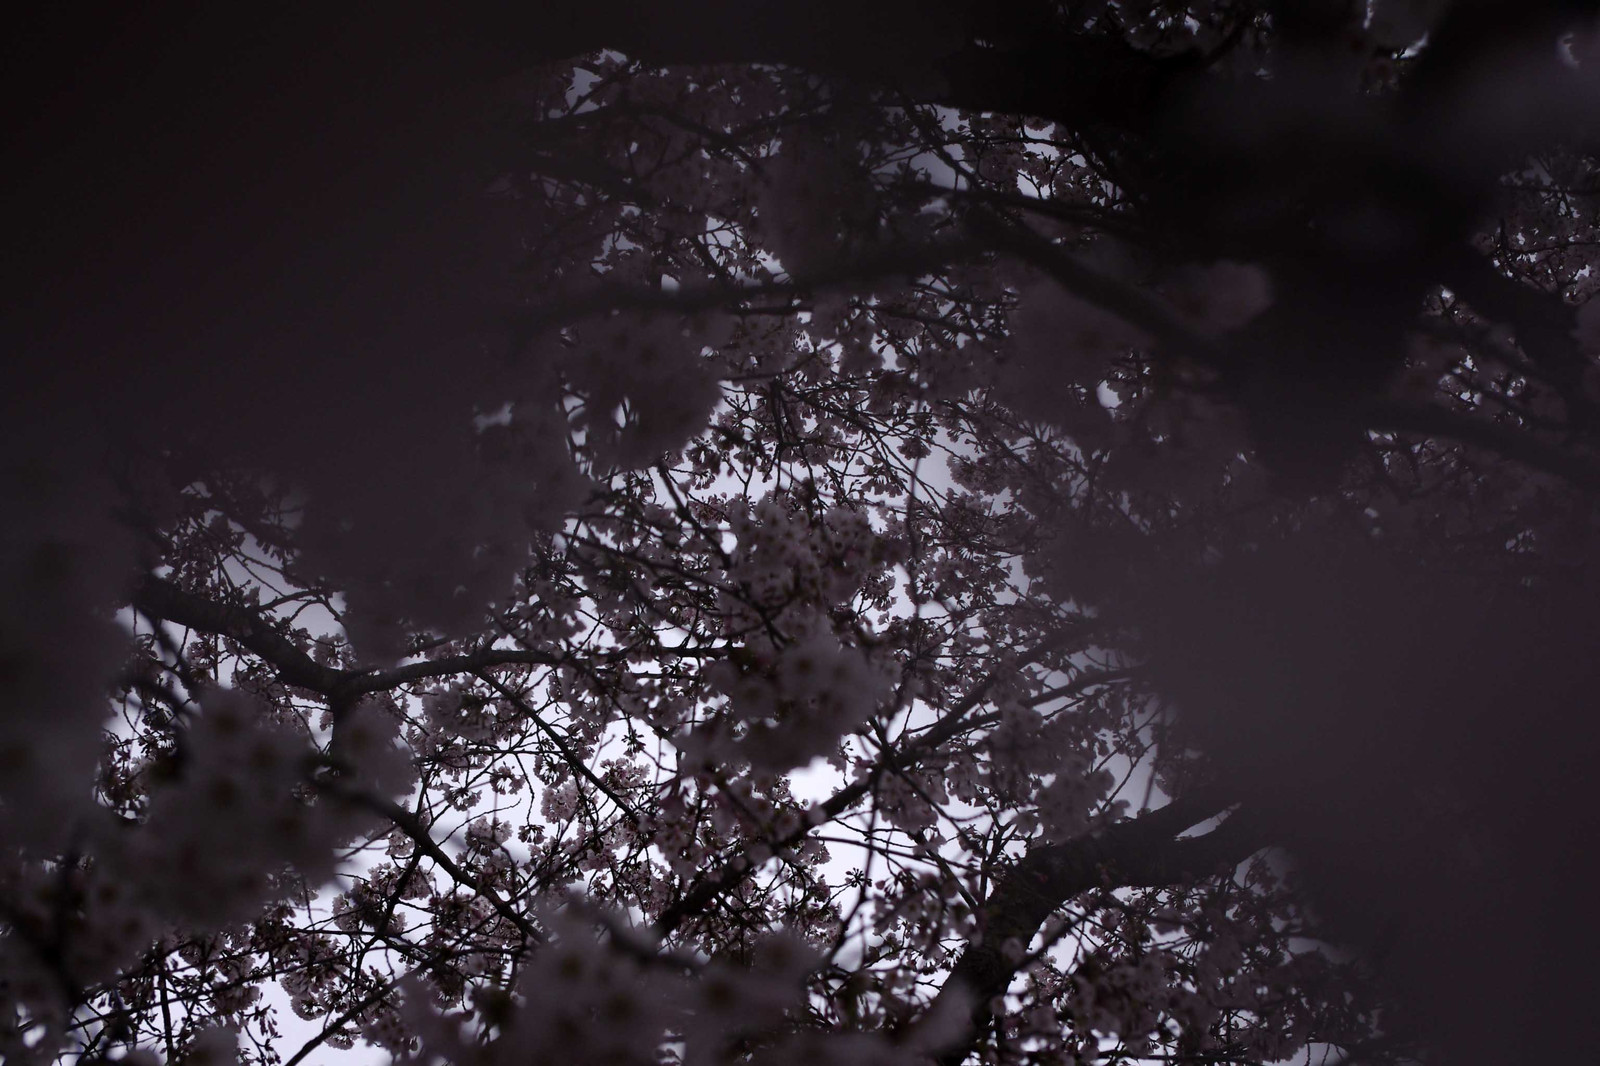 2012_04_22_3993_edited1